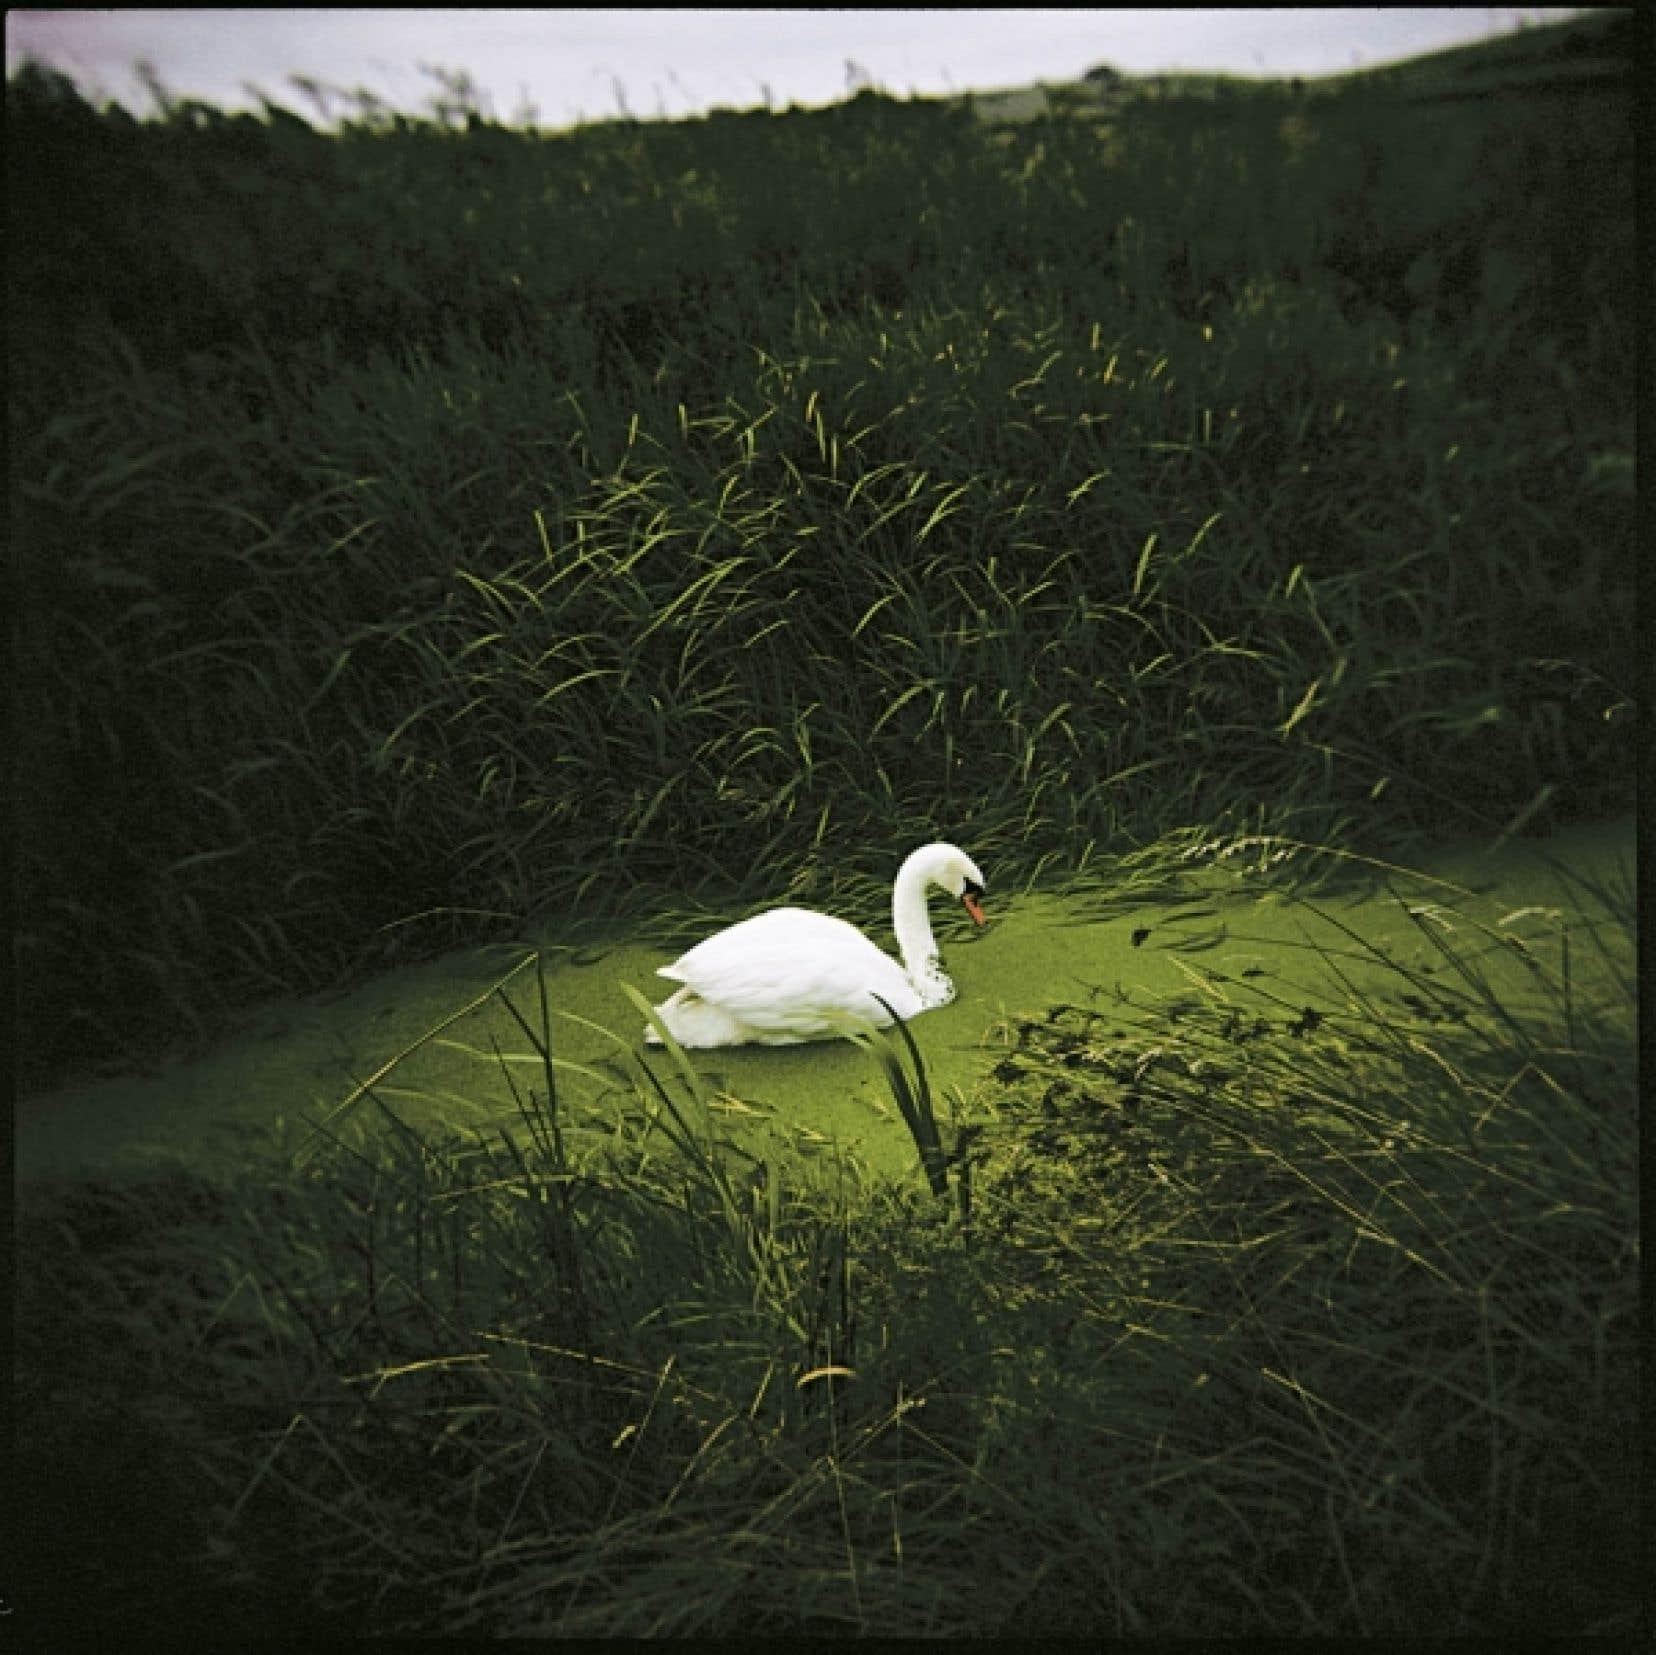 Ce cygne symbolise la mort de Virginia Woolf.<br />